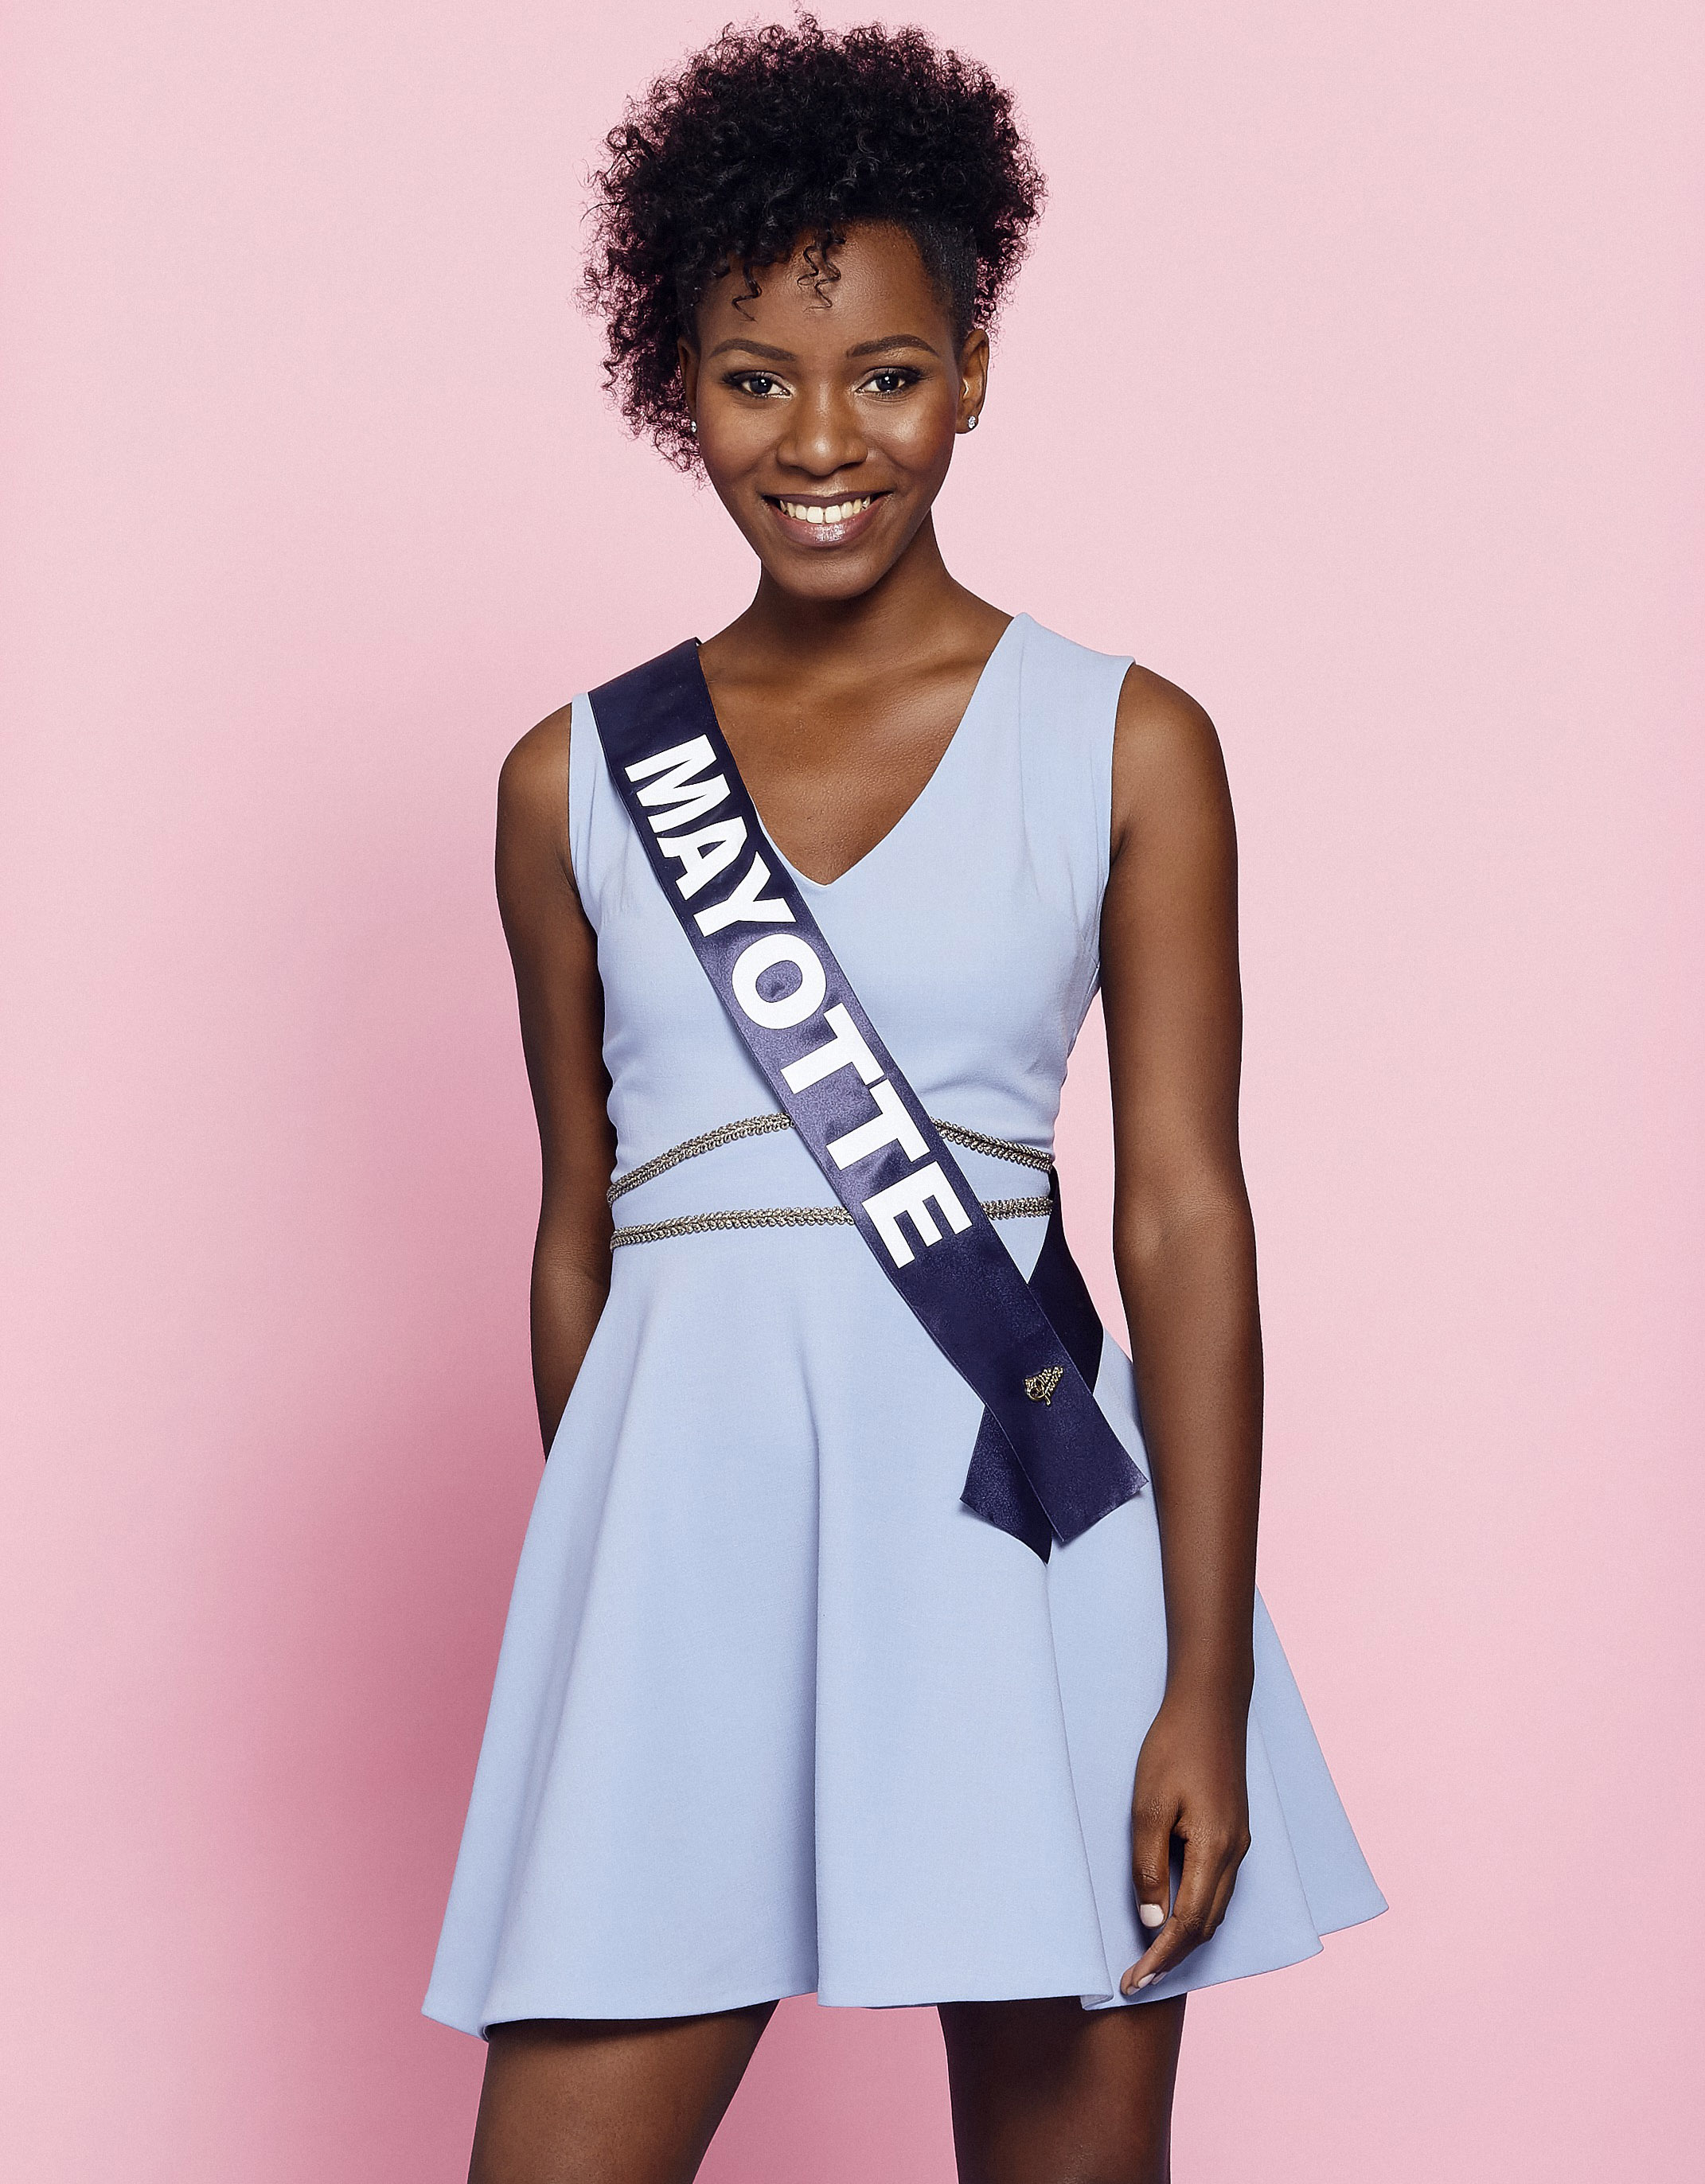 Miss Mayotte - Ousna Attoumani